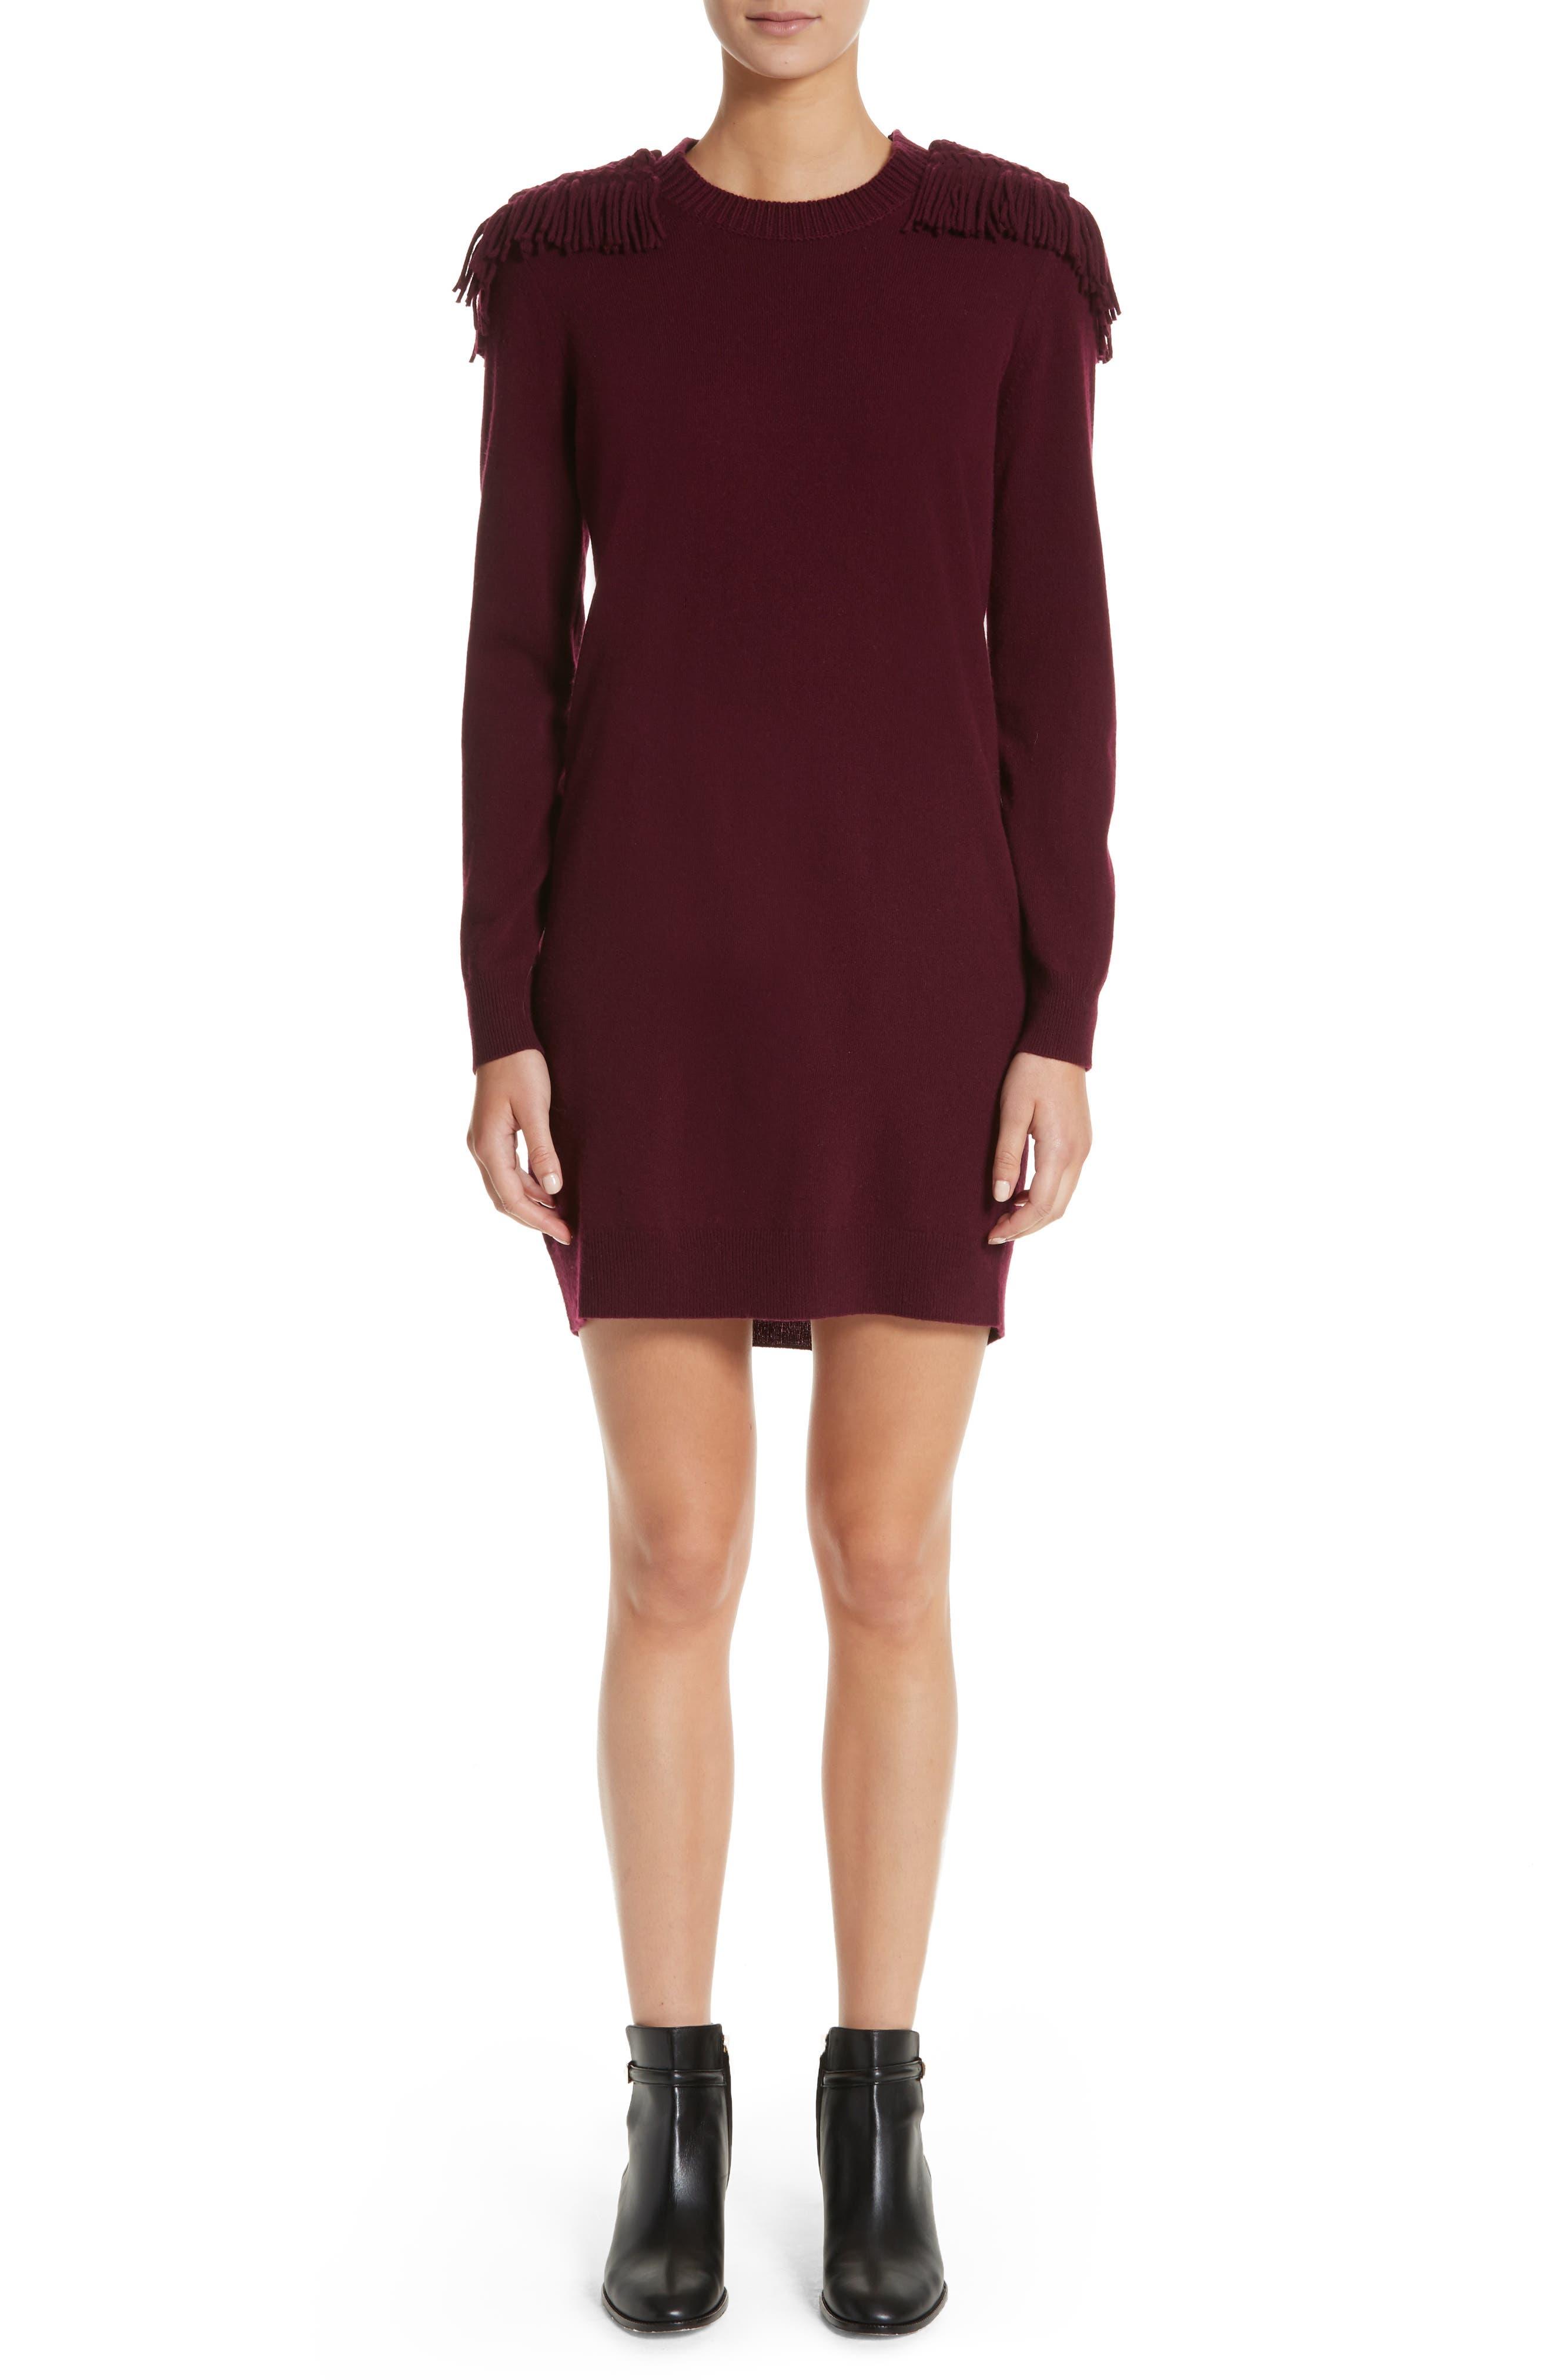 Burberry Neto Wool & Cashmere Fringe Sweater Dress